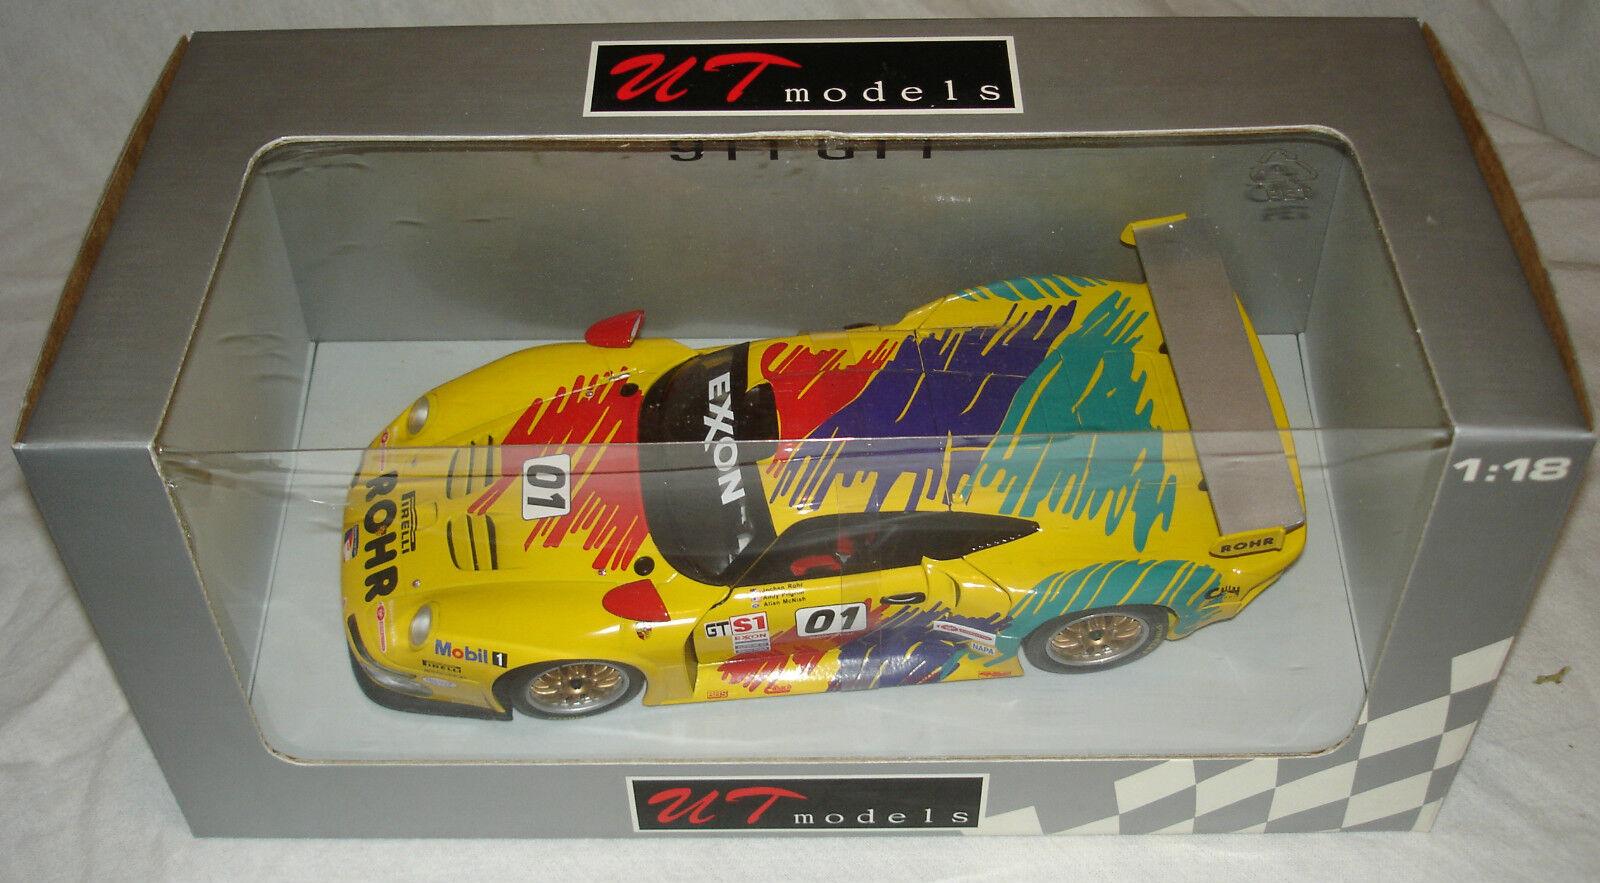 UT MODELS 1:18 1997 PORSCHE 911 GT1 GT1 GT1 Rohr Racing Allan McNish & Andy PILGRIM neuf d39651